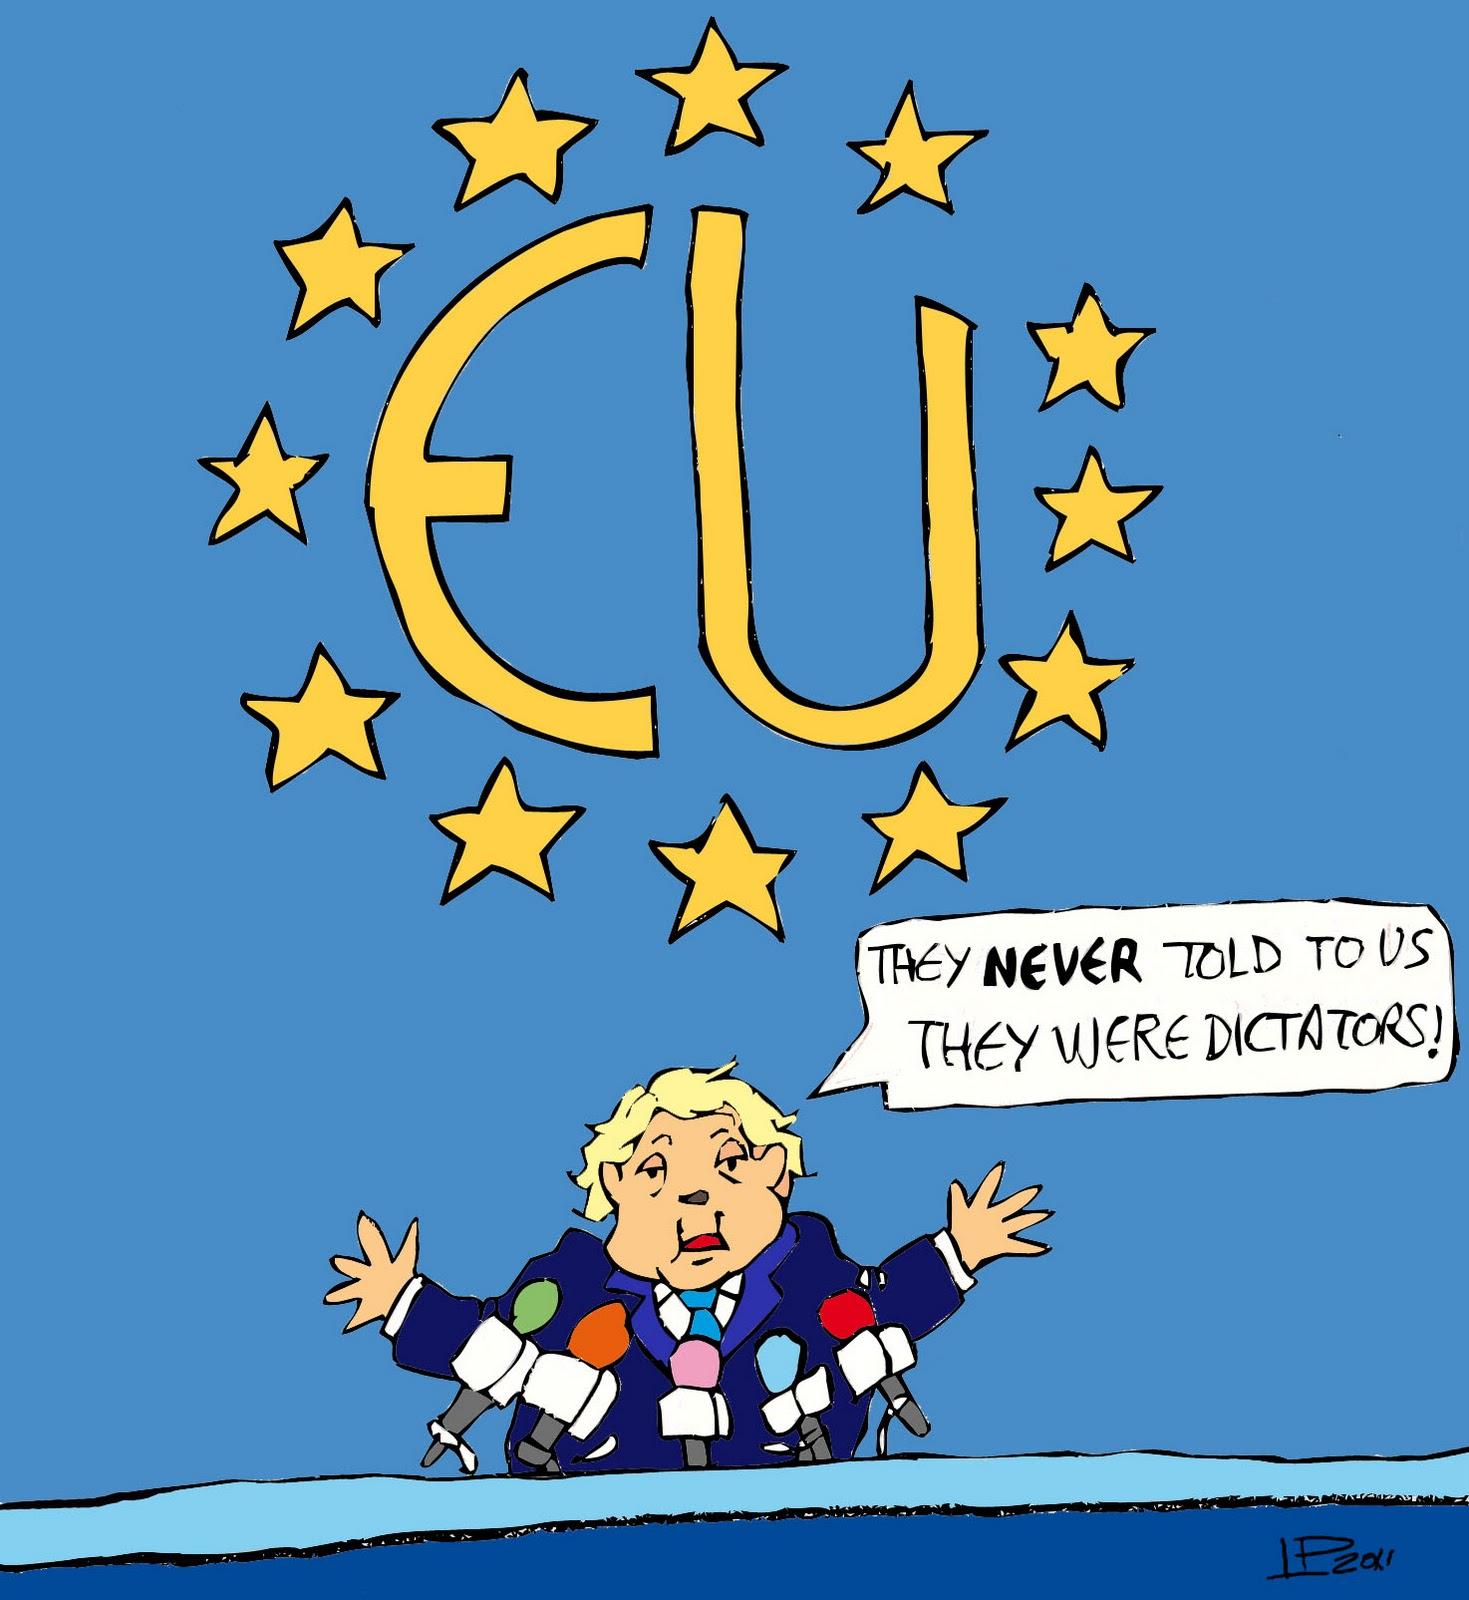 EU faces crisis as IMF warns Greek debts are on 'explosive' path